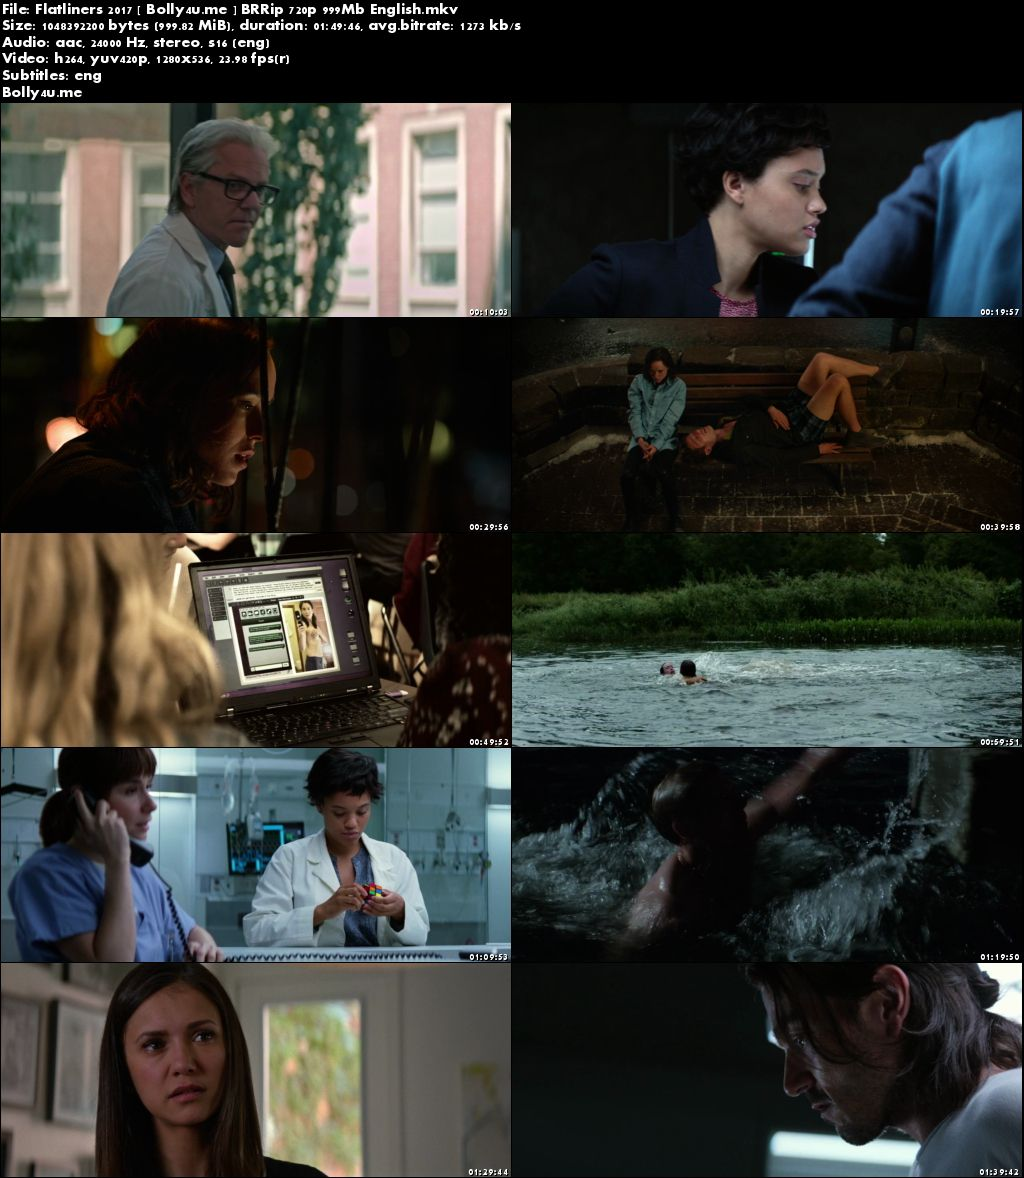 Flatliners 2017 BluRay 300Mb English Movie 480p ESub Download